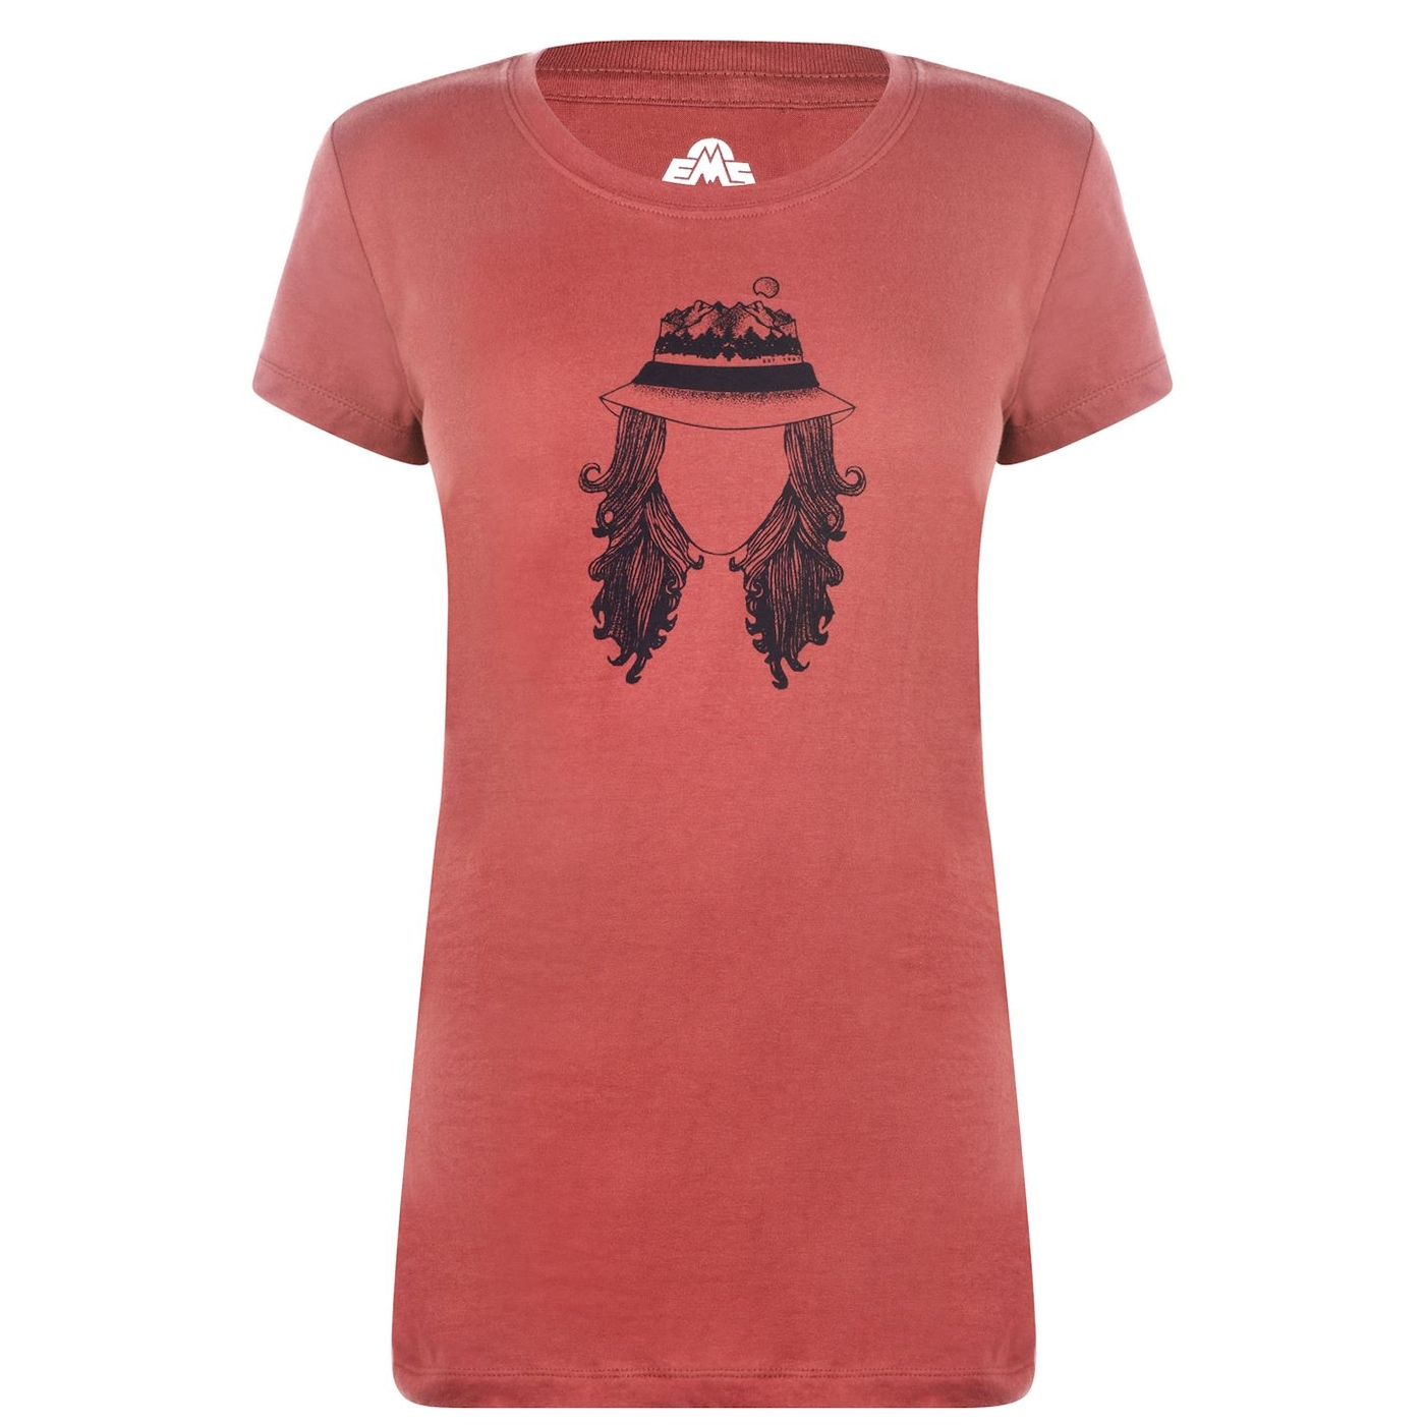 Eastern Mountain Sports Head T Shirt Ladies